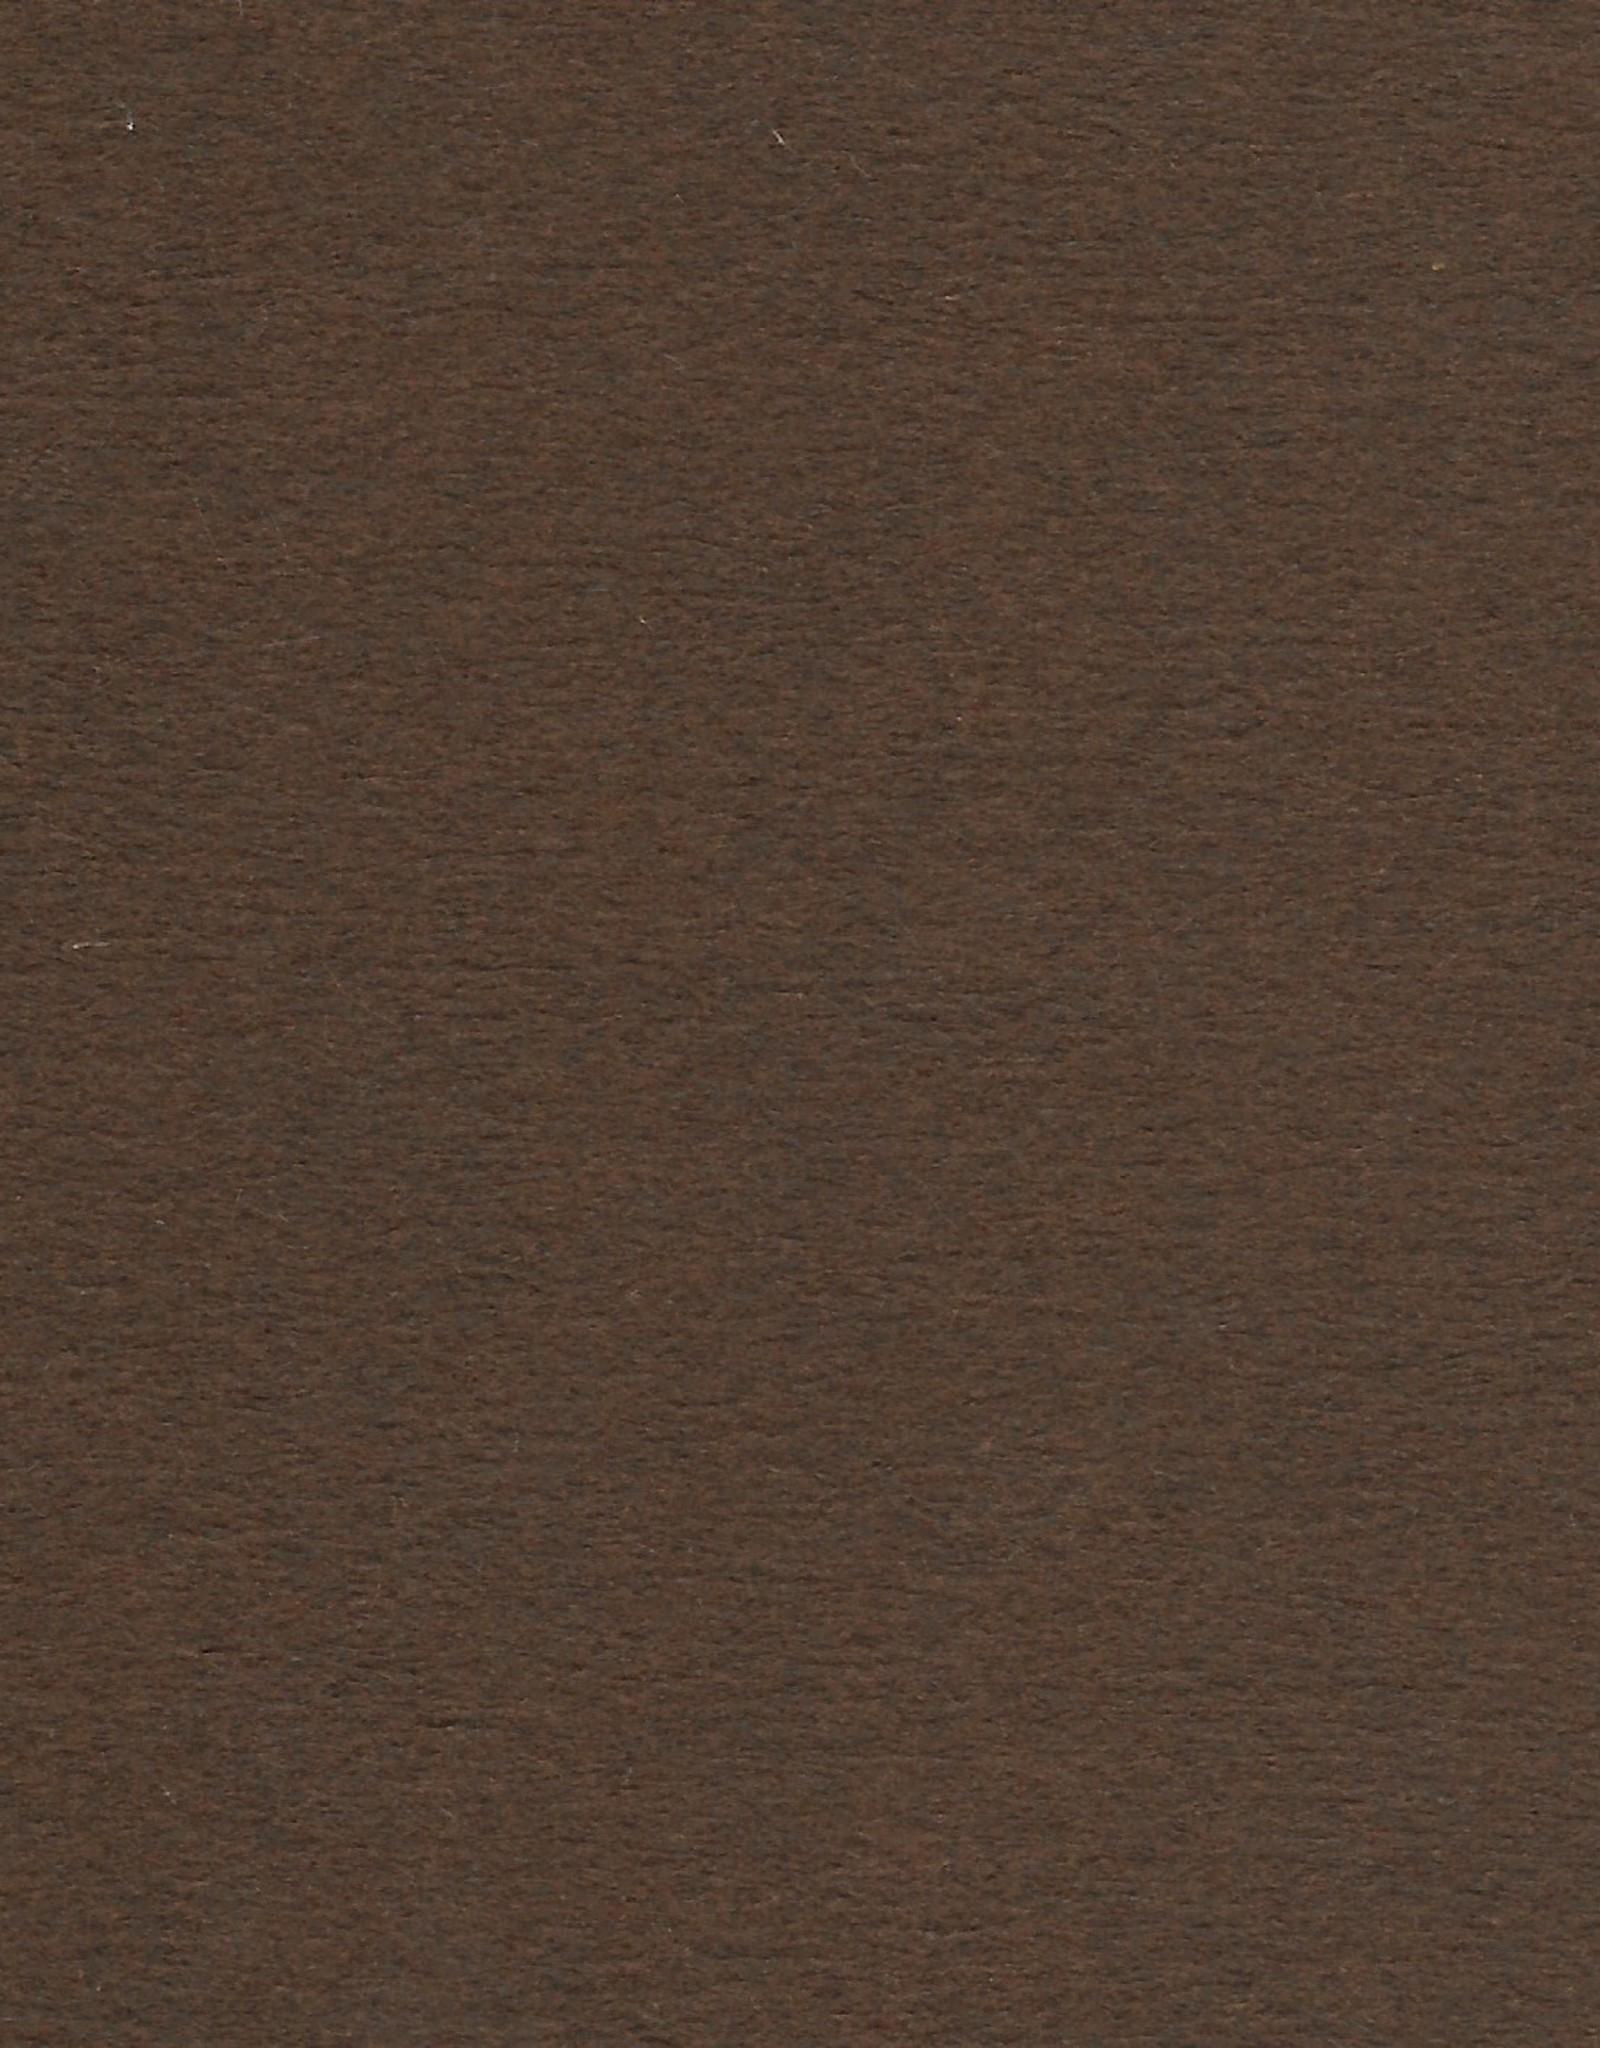 "Colorplan, 91#, Text, Bagdad Brown, 25"" x 38"", 135 gsm"